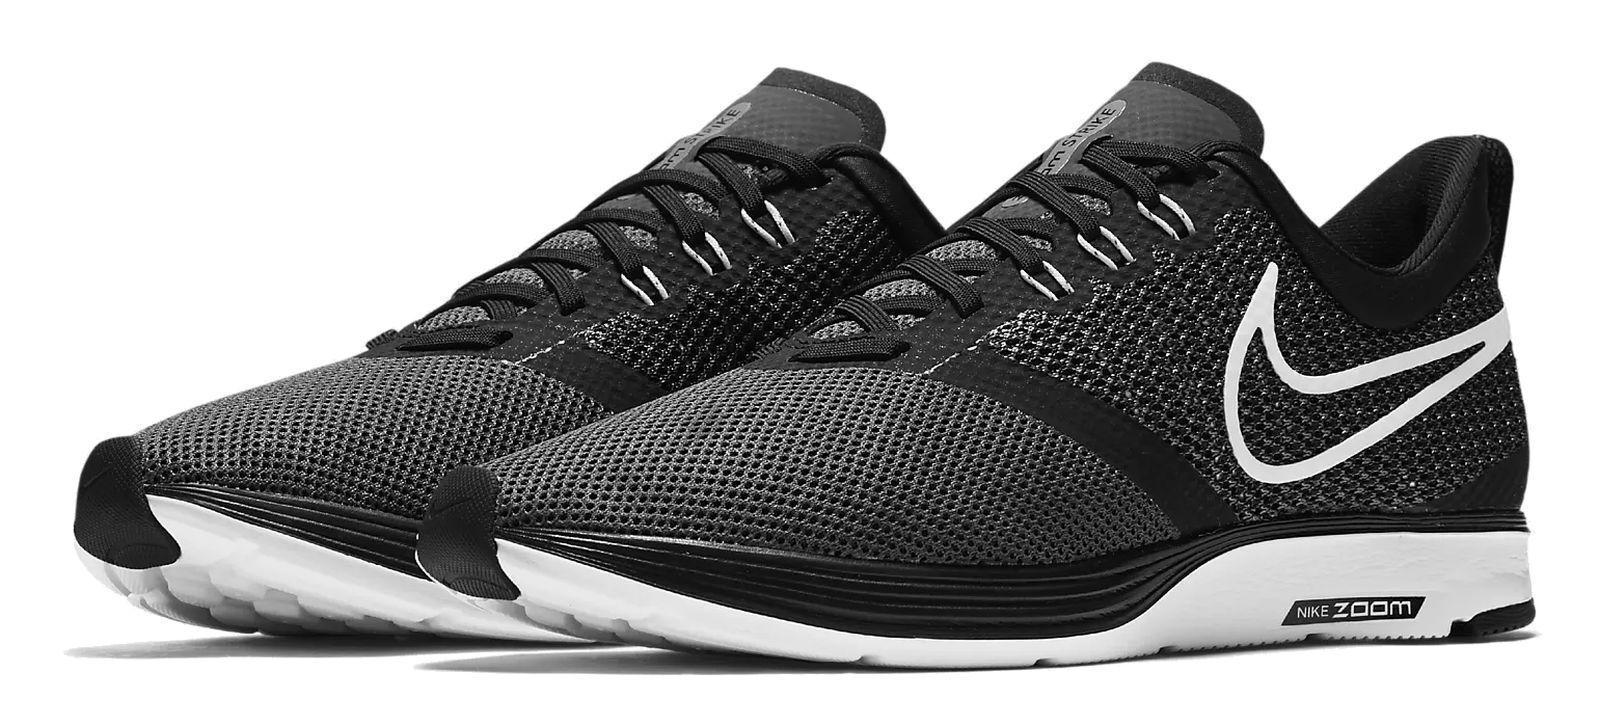 Nike Zoom Strike Strike Strike caballero zapatos zapatillas calzado deportivo cortos aj0189-001 nuevo b3c14a